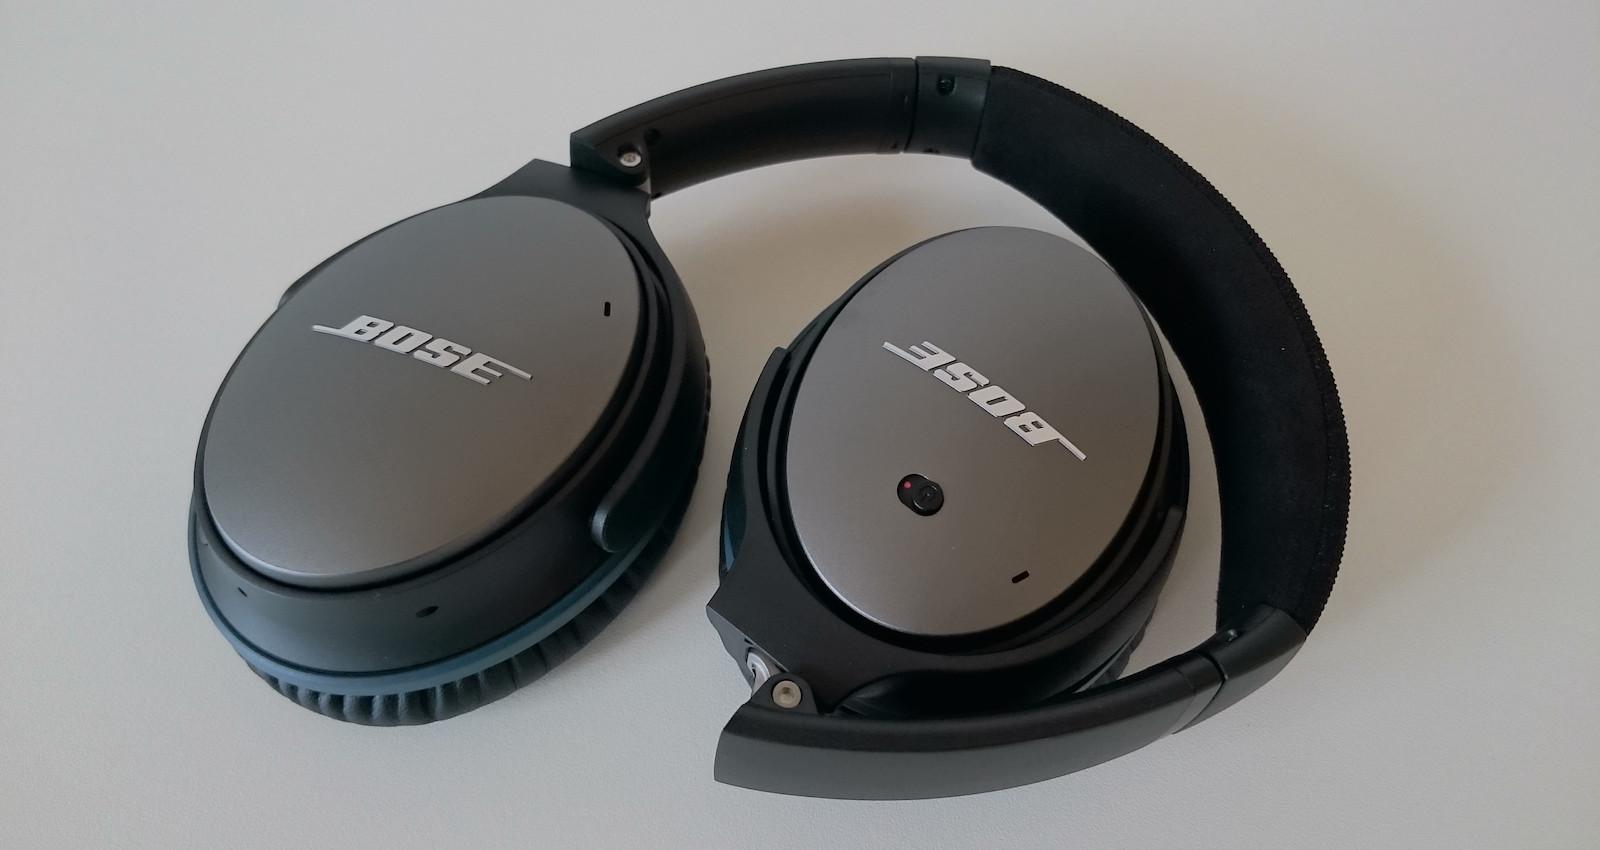 Bose QuietComfort 25 Testbericht